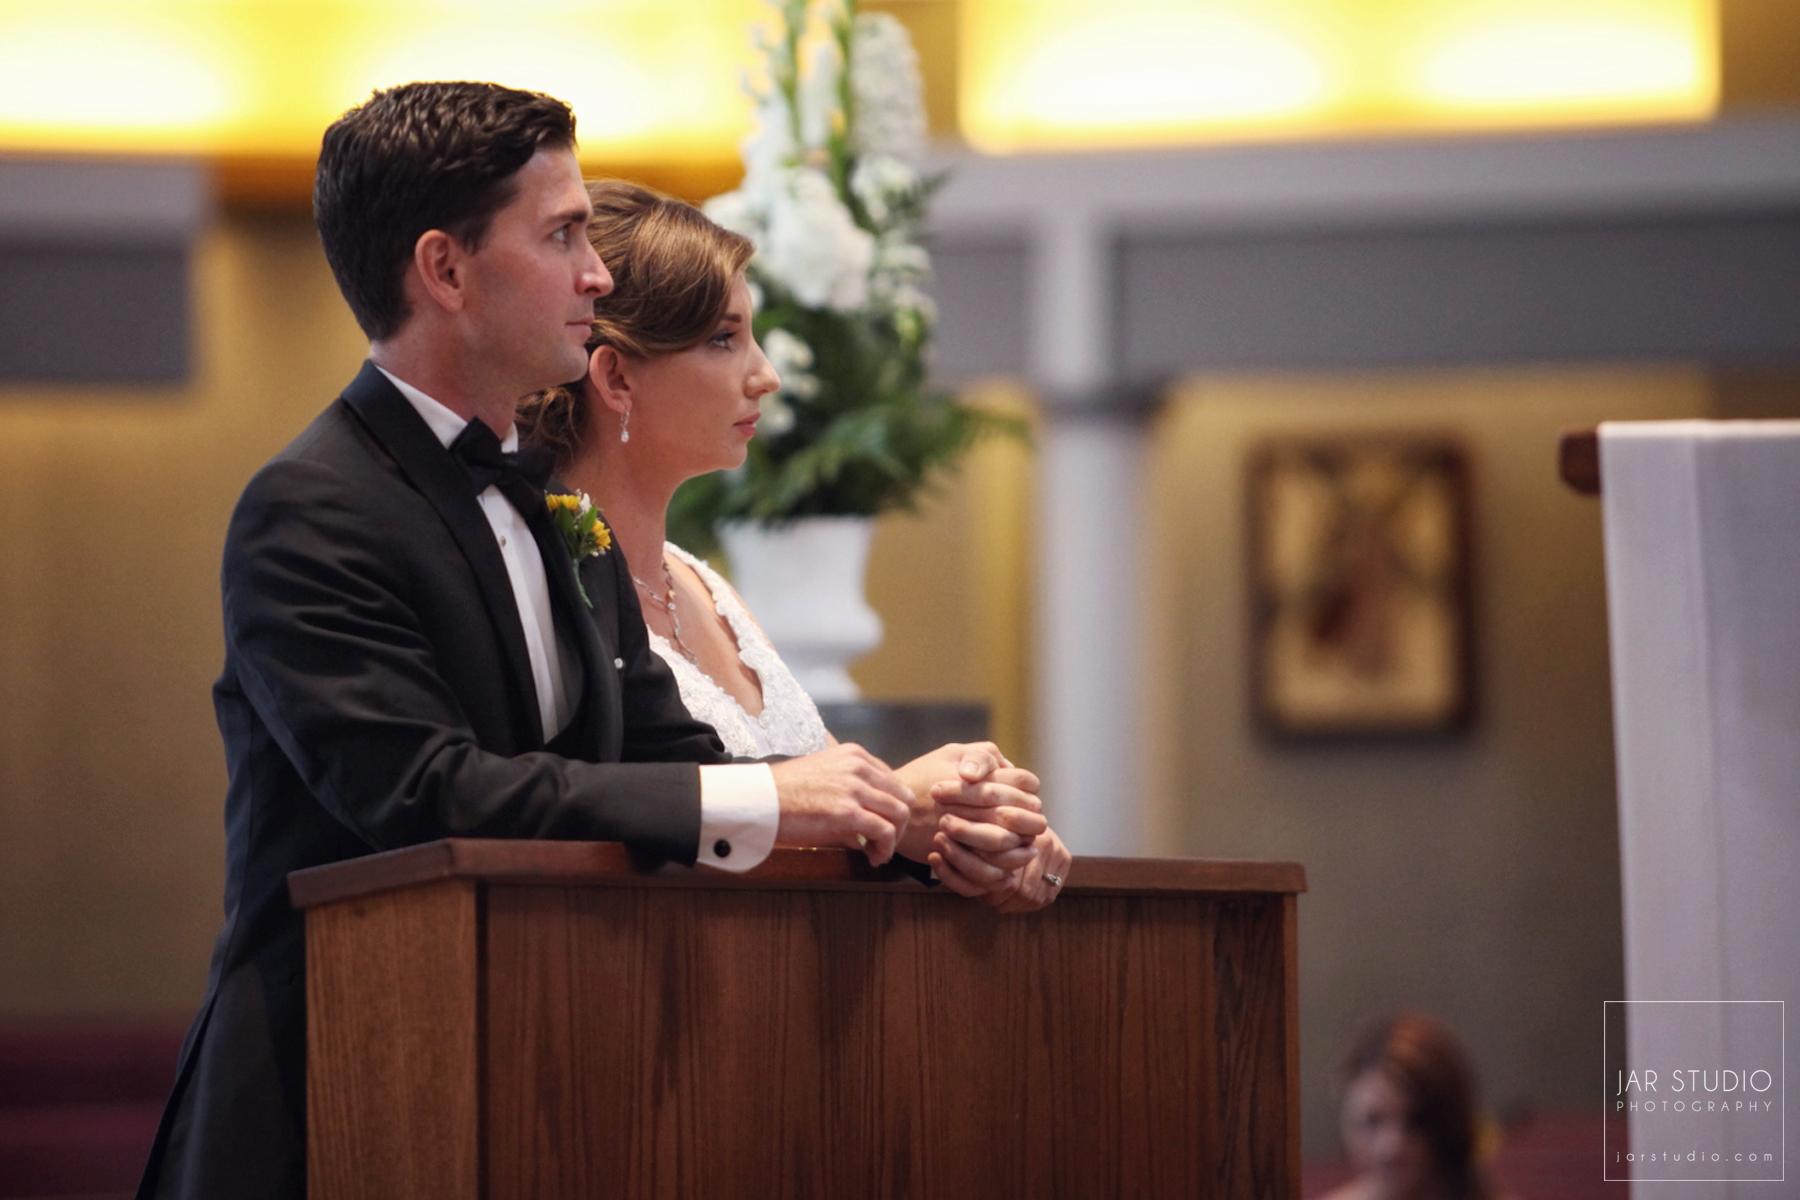 11-wedding-ceremony-orlando-weddings-jarstudio-photography.JPG